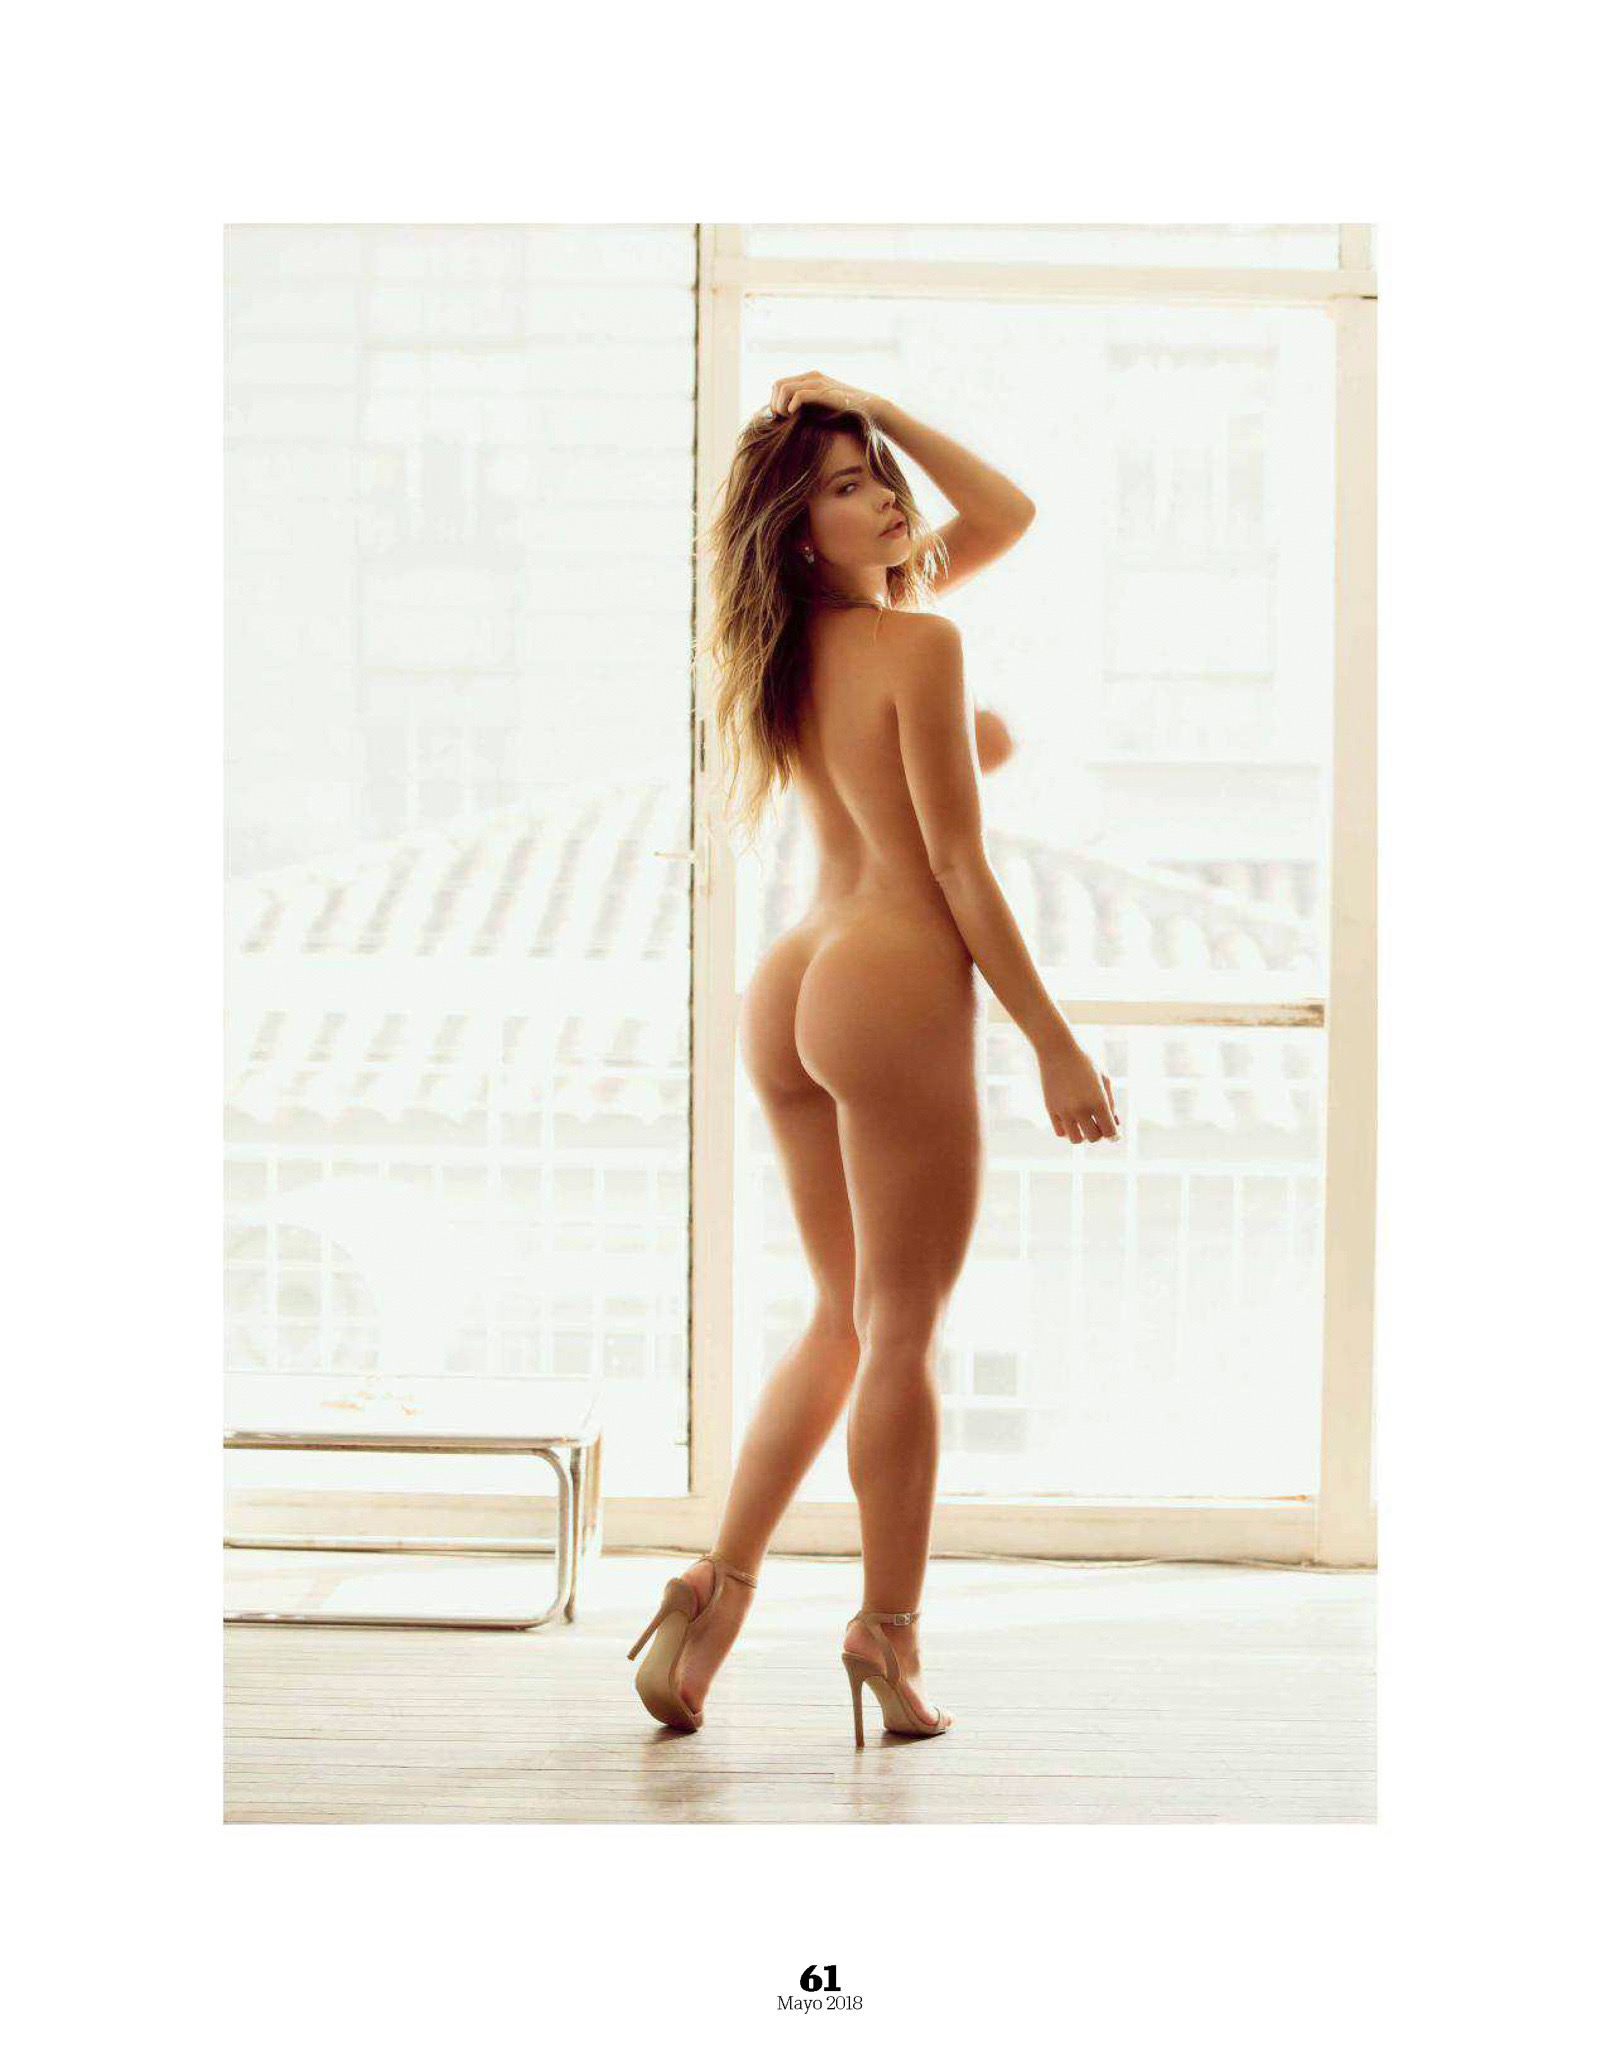 fabitogomez_201805-Playboy México-67.jpg